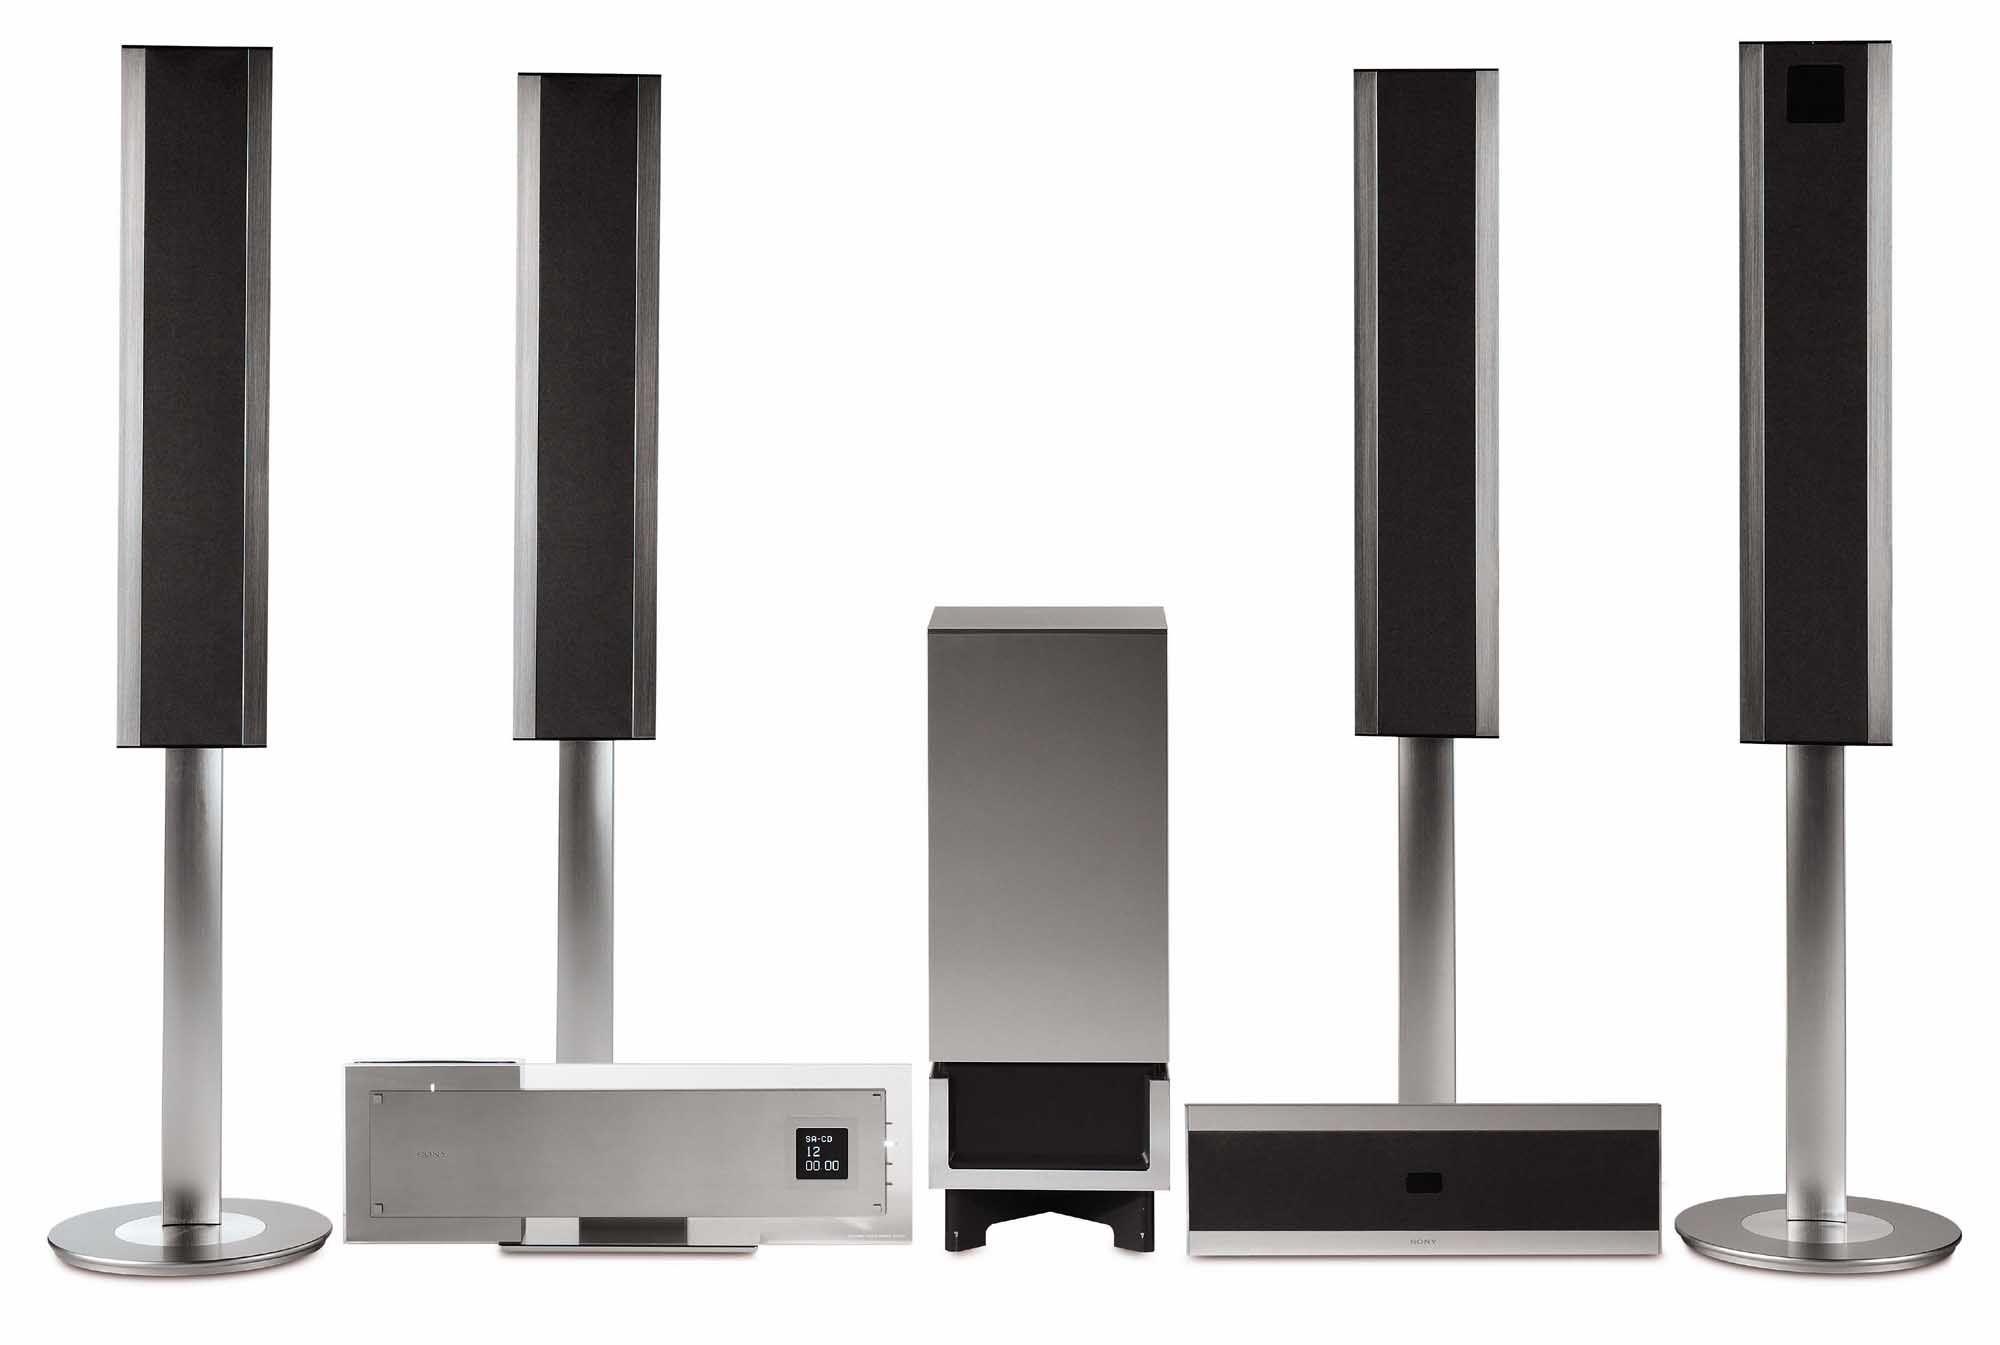 SONY DAV-LF1 DVD wireless home theater system | İ want | Pinterest ...